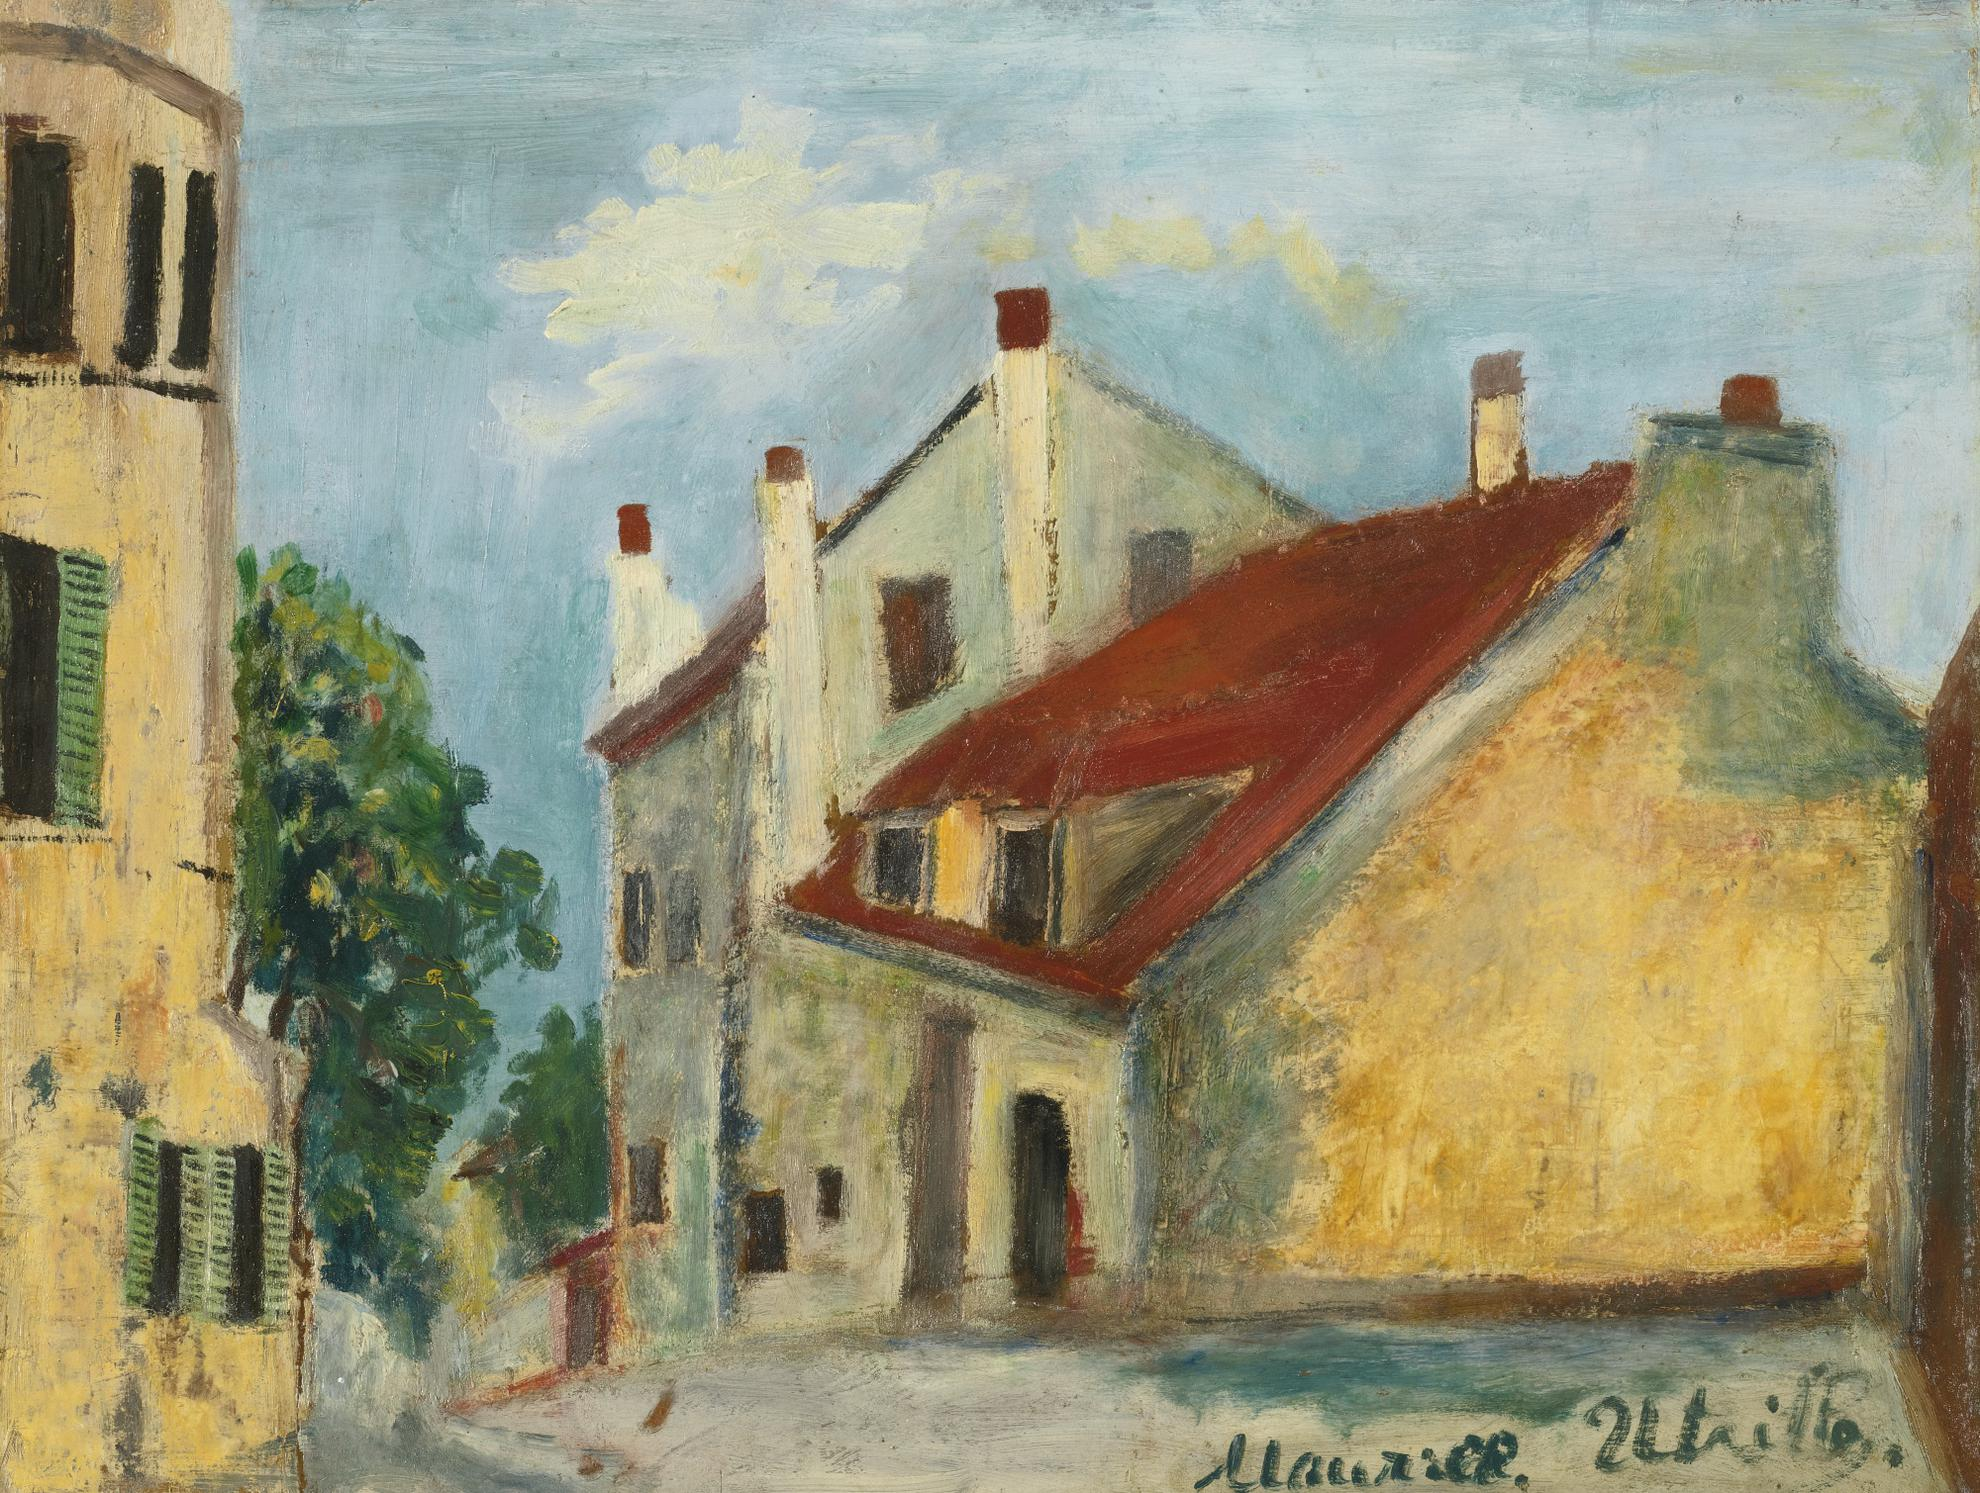 Maurice Utrillo-La Maison De Mimi Pinson-1915